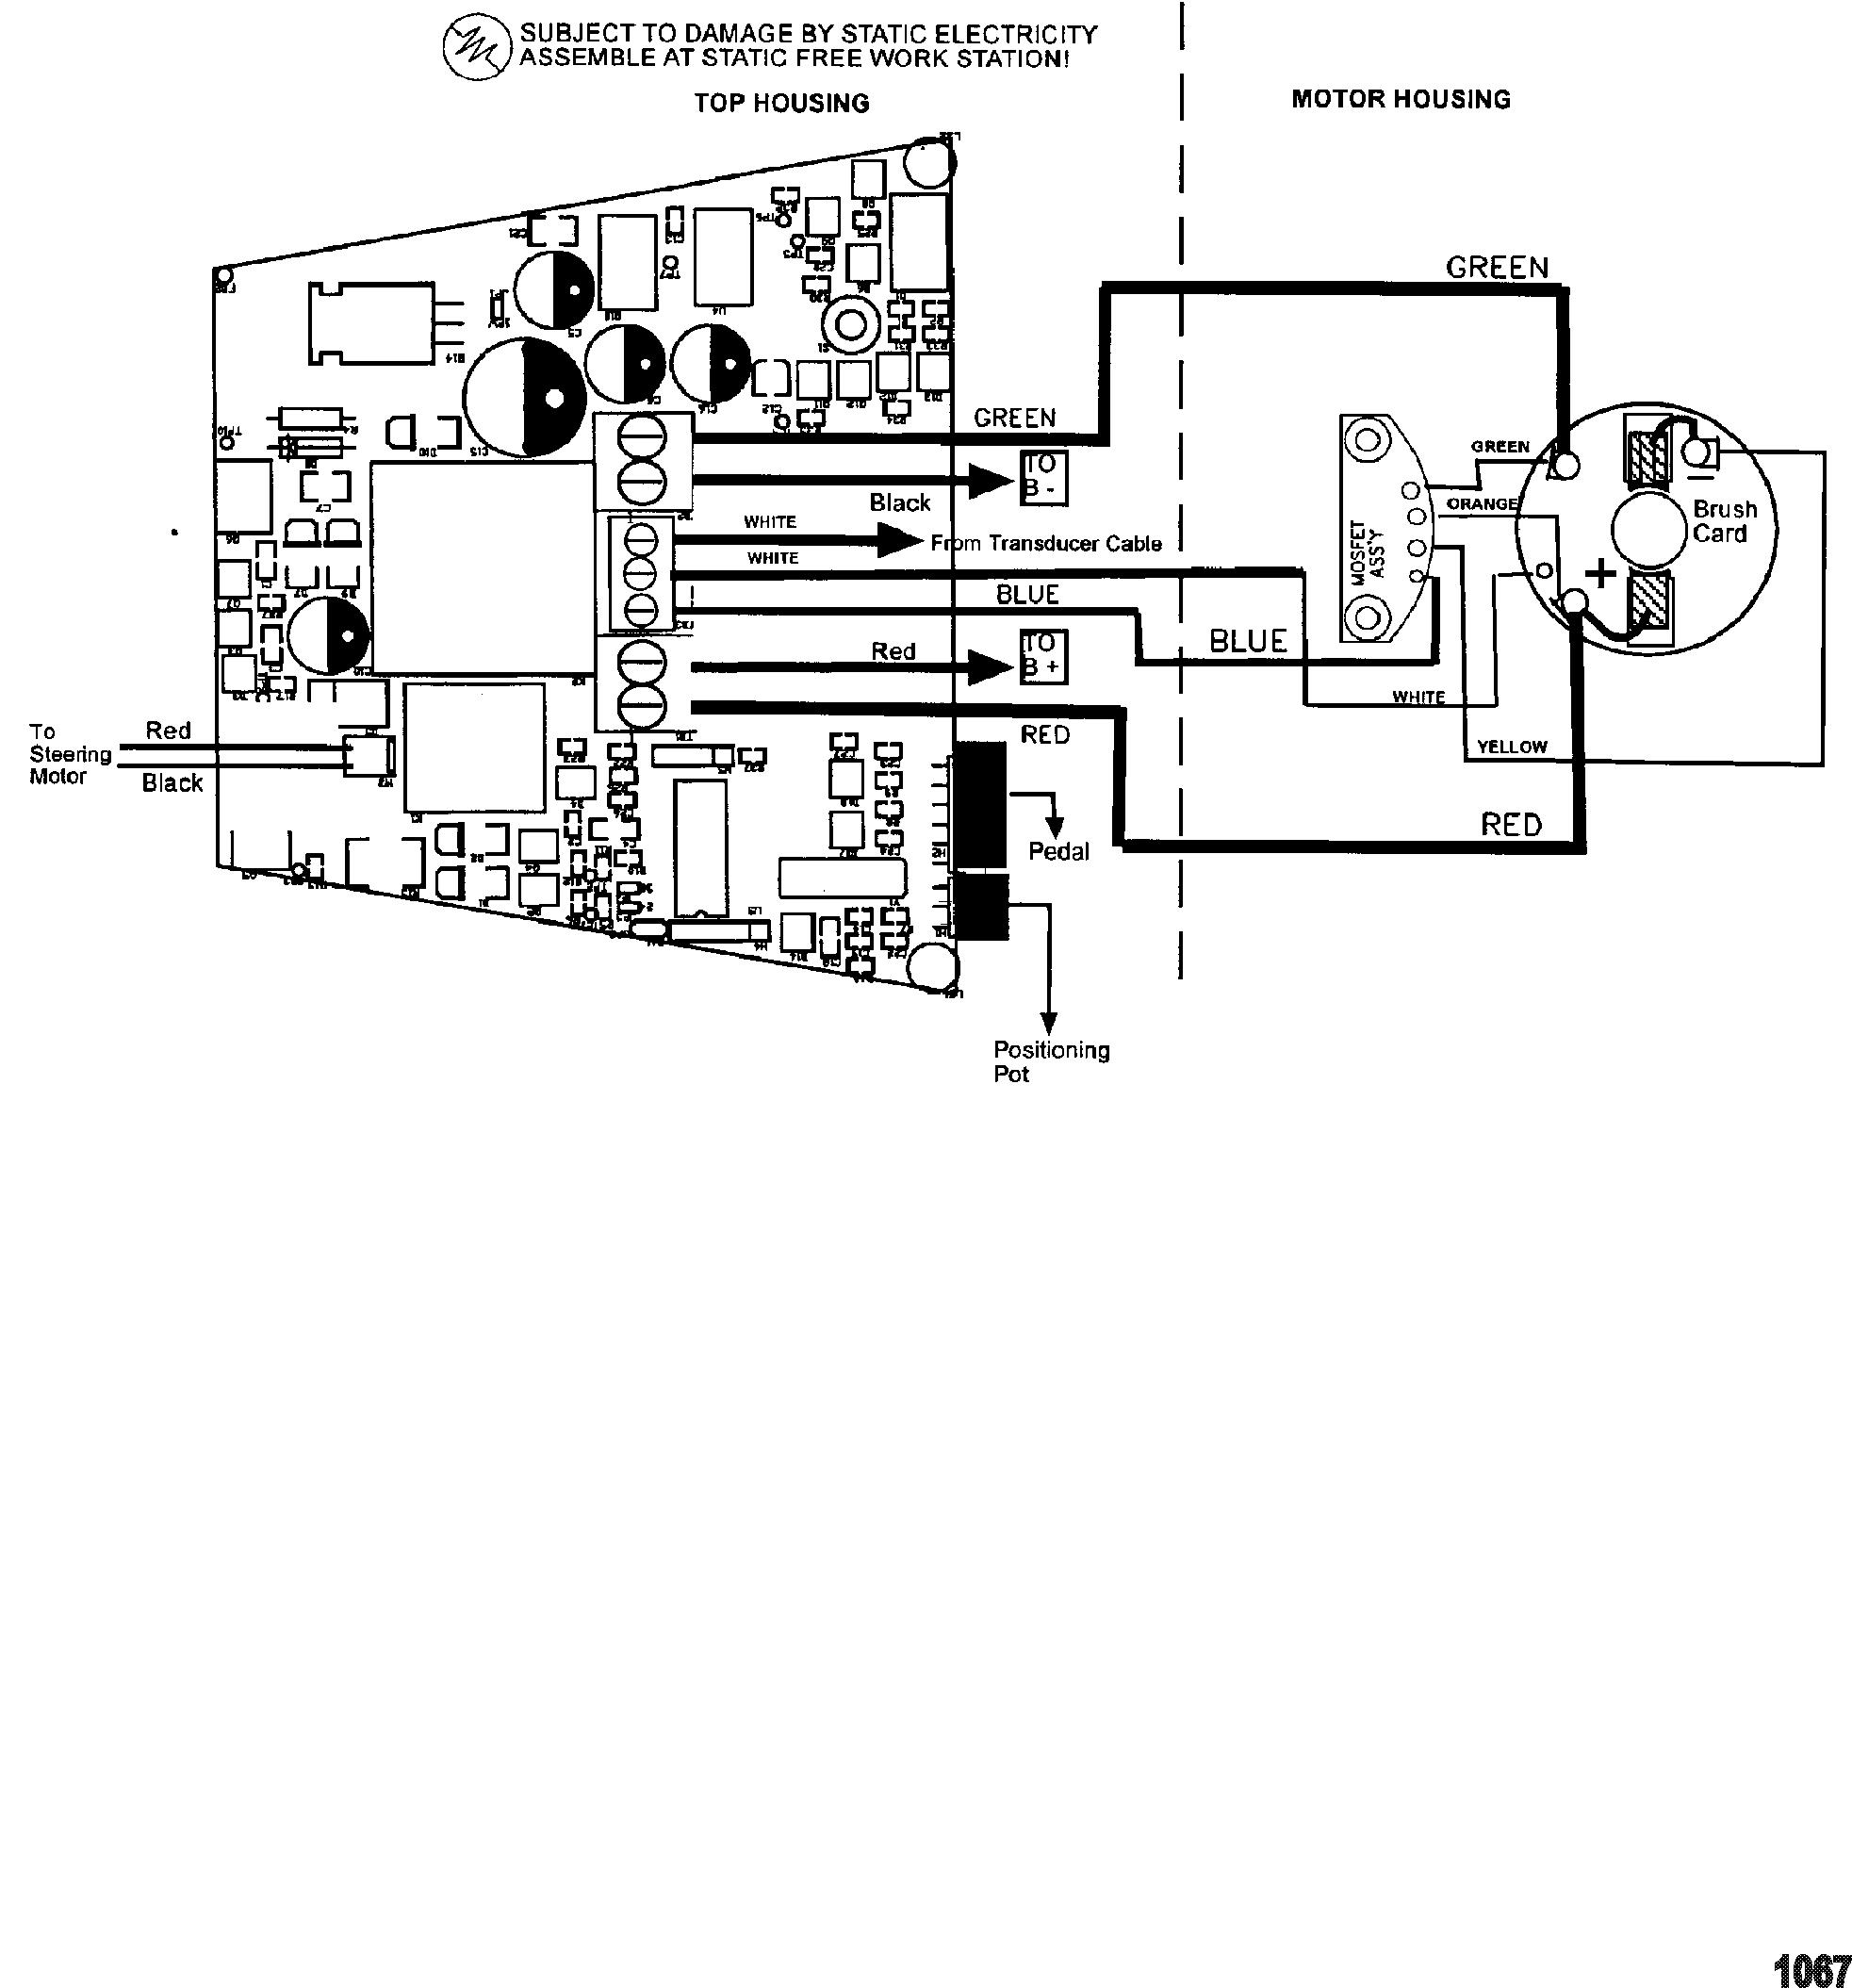 motorguide trolling motor wiring    motorguide trolling motor wiring    diagram impremedia net     motorguide trolling motor wiring    diagram impremedia net